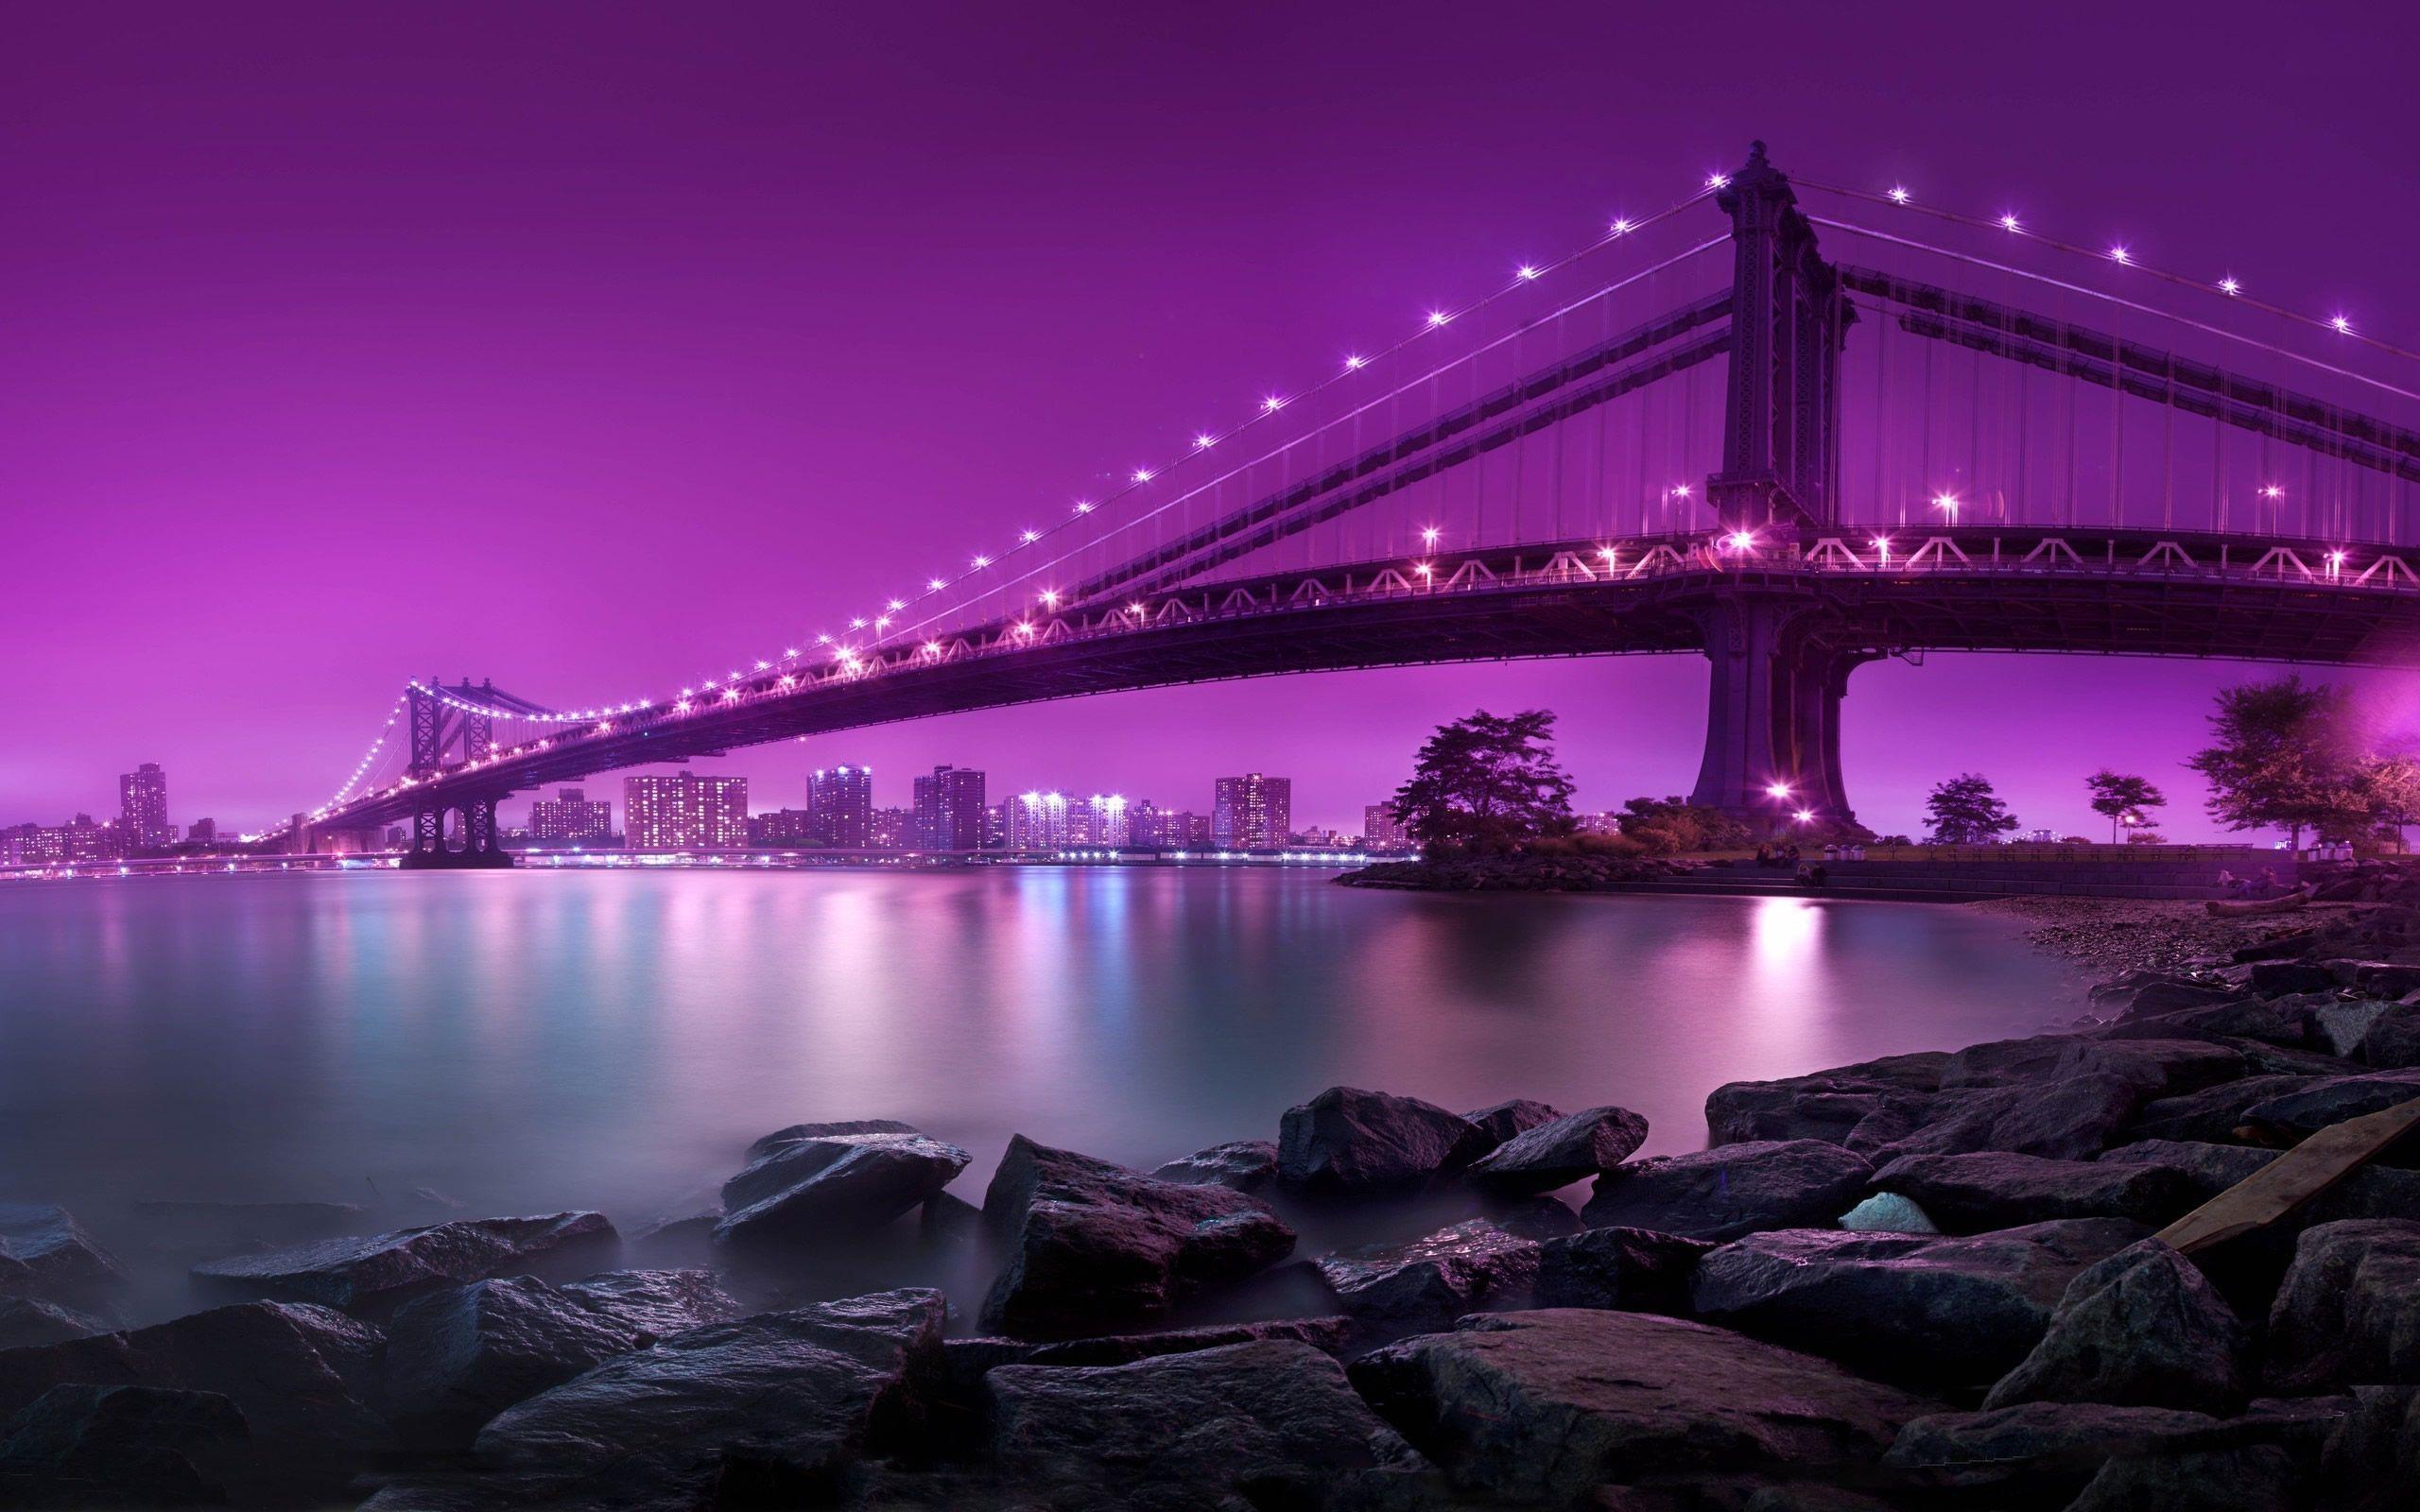 Purple HD Wallpapers - Wallpaper Cave